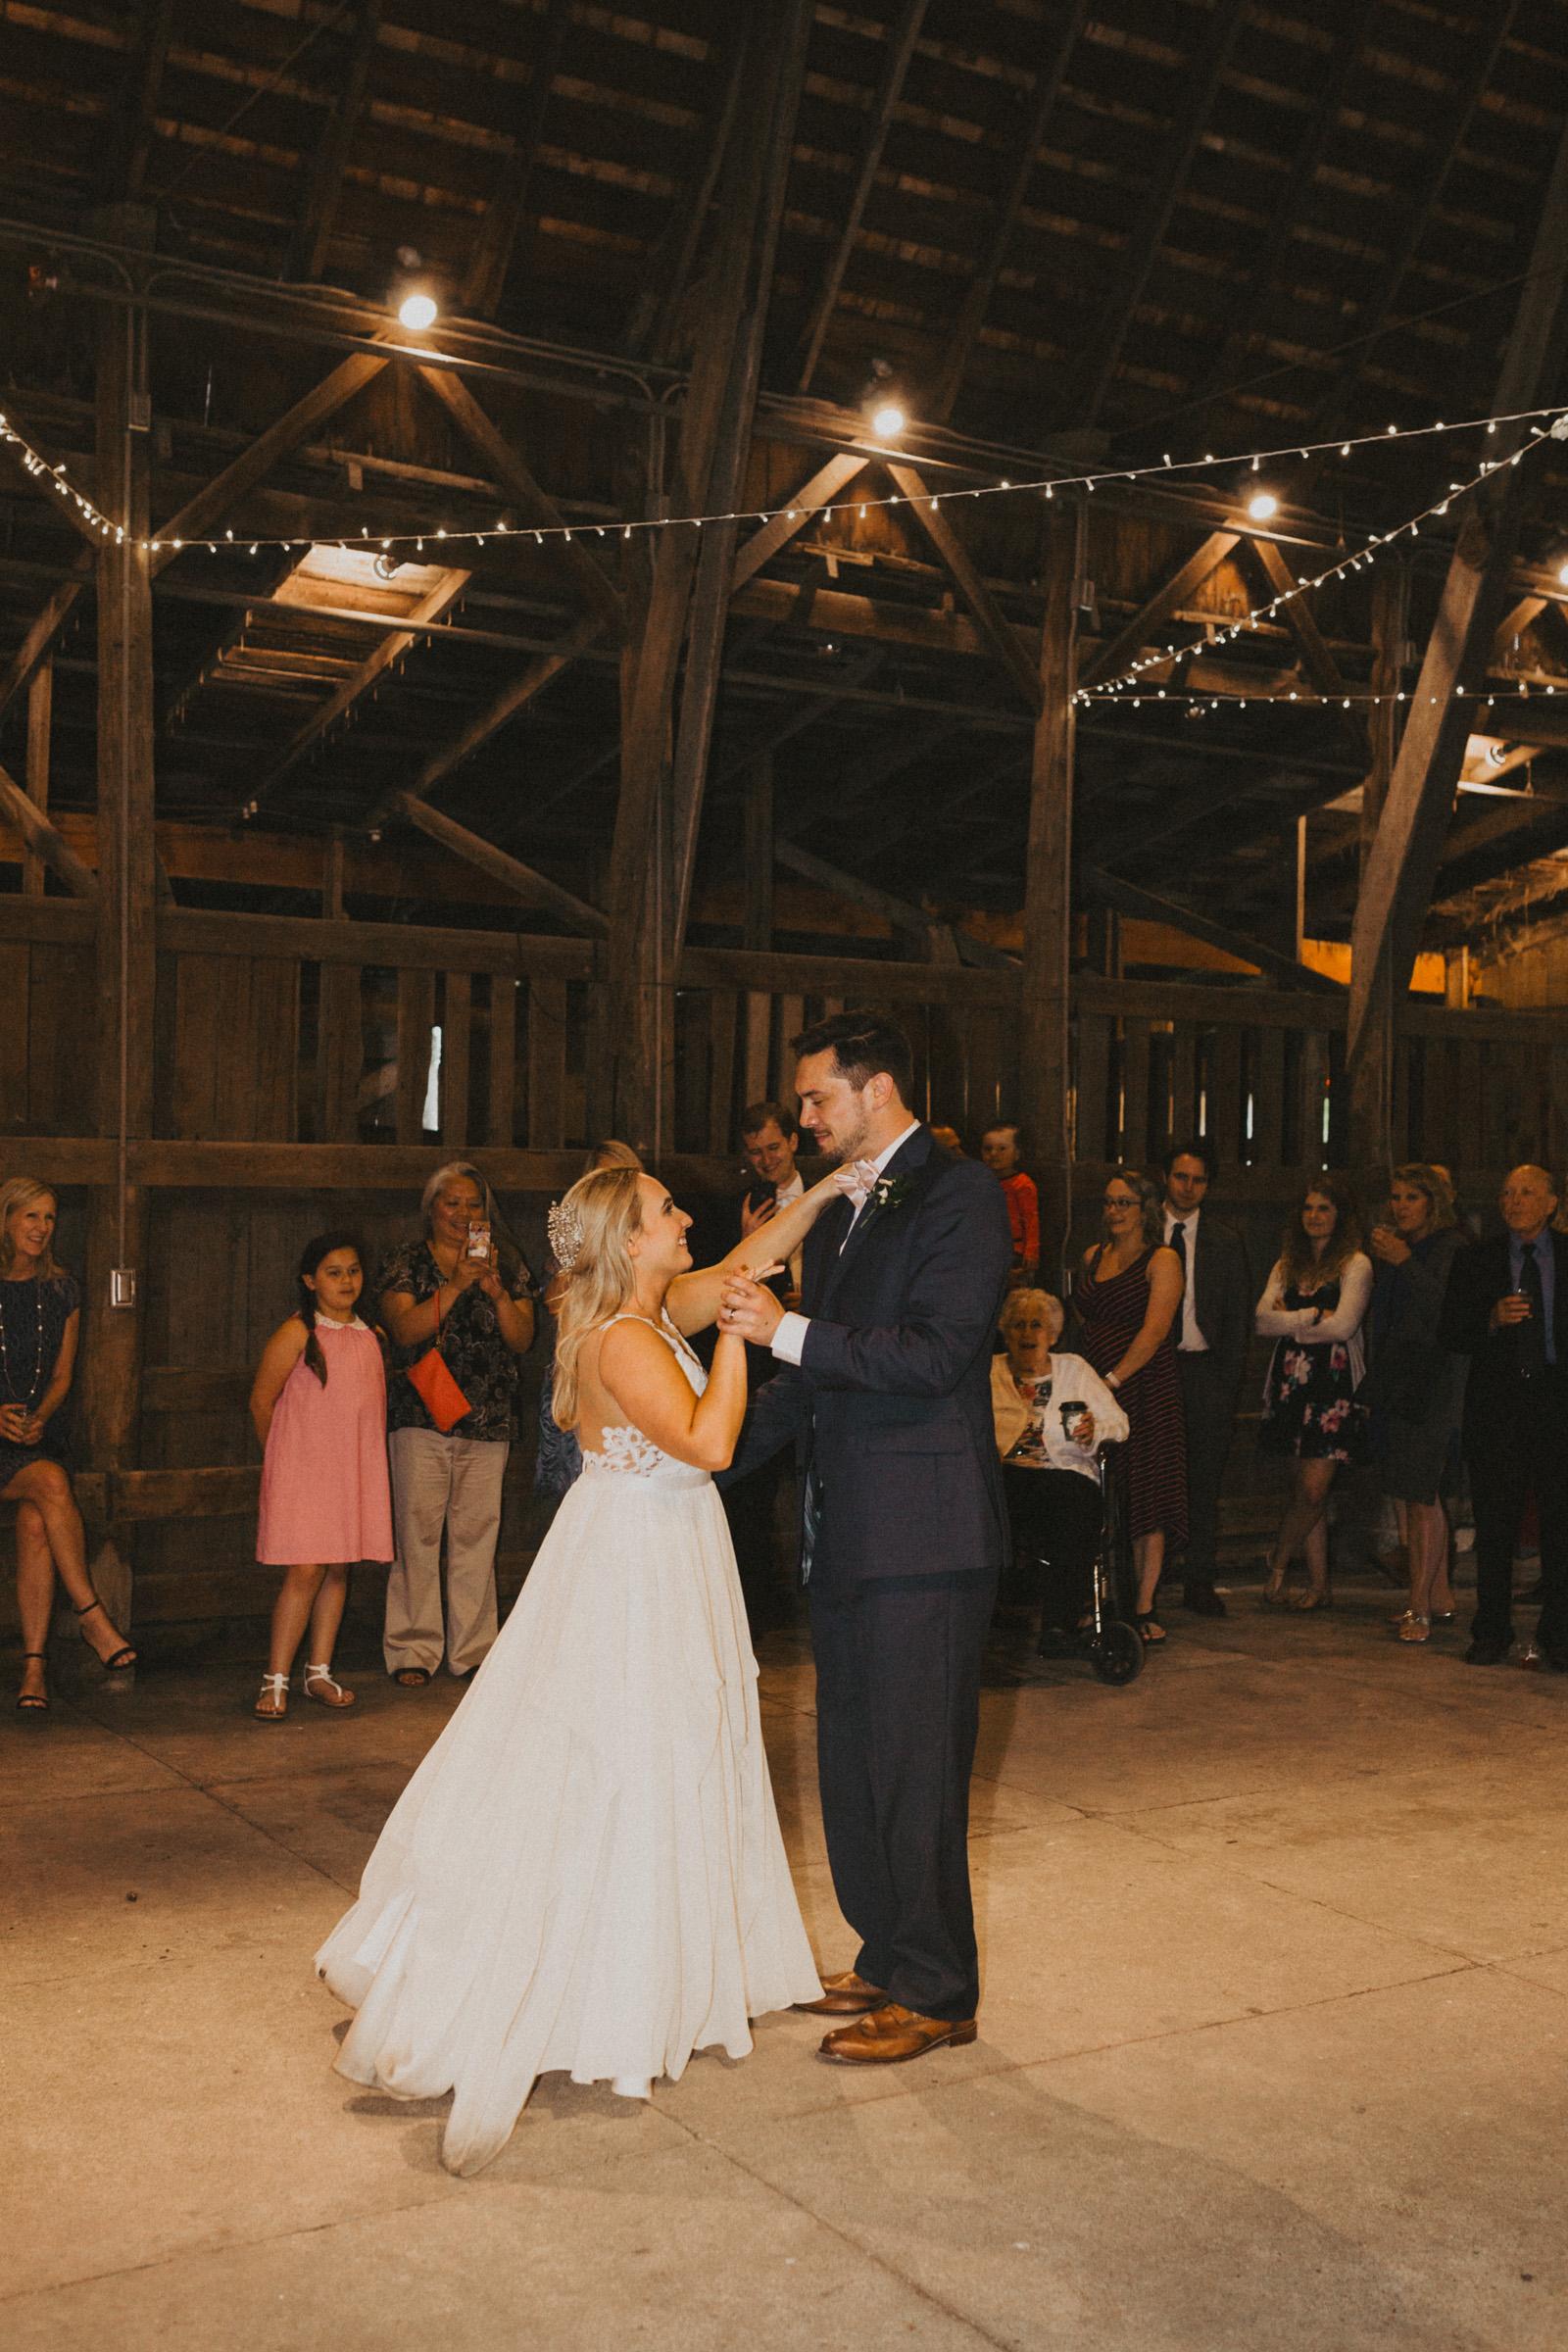 alyssa barletter photography nelson wedding nebraska city lied lodge morton barn spring wedding photographer-59.jpg